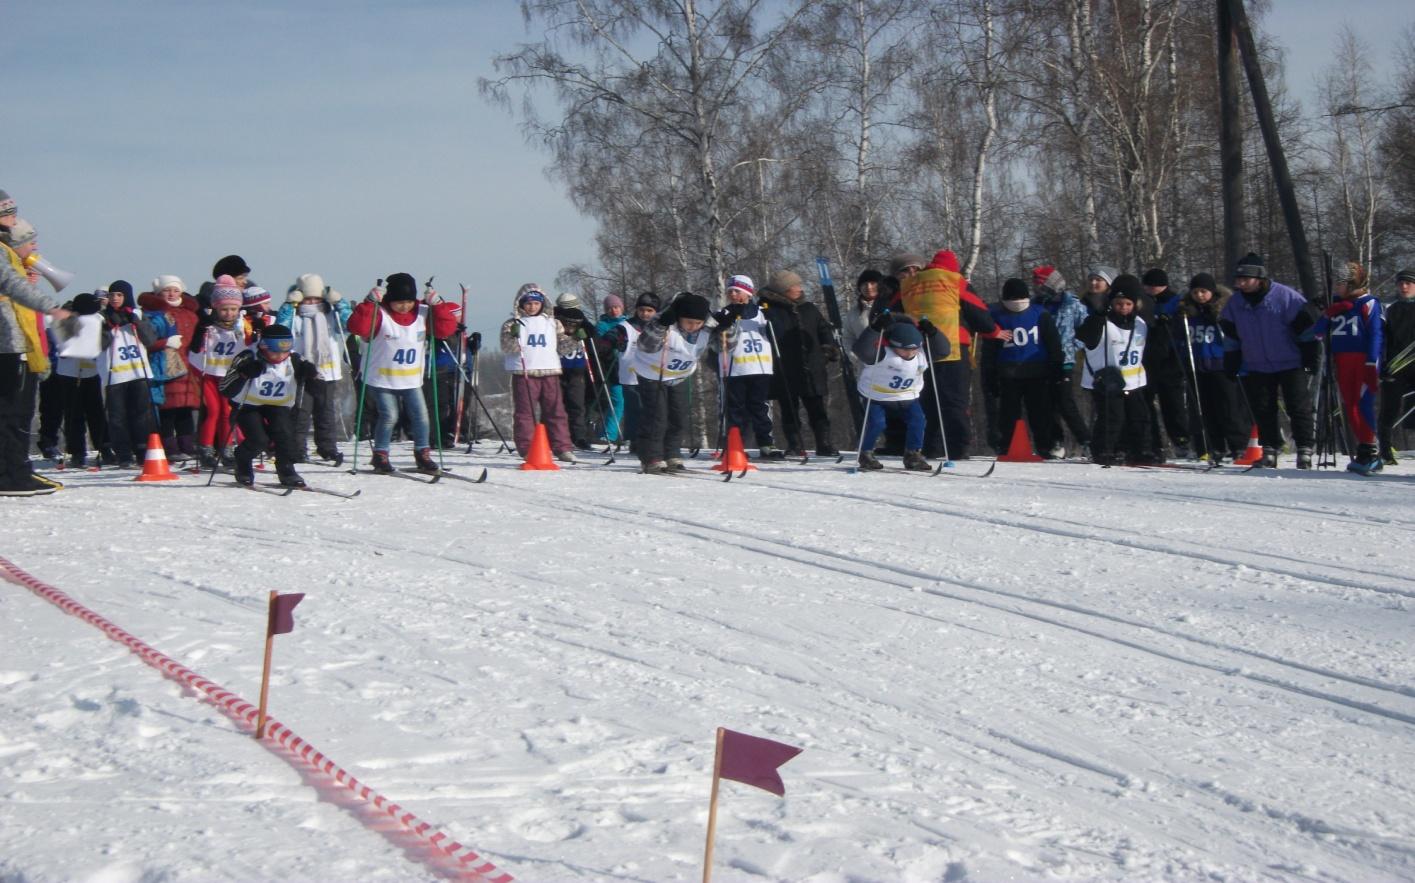 C:\Documents and Settings\Admin2.HOME\My Documents\МОИ ФОТО\лыжи фото\лыжи 2012\лыжи 2012 062.jpg